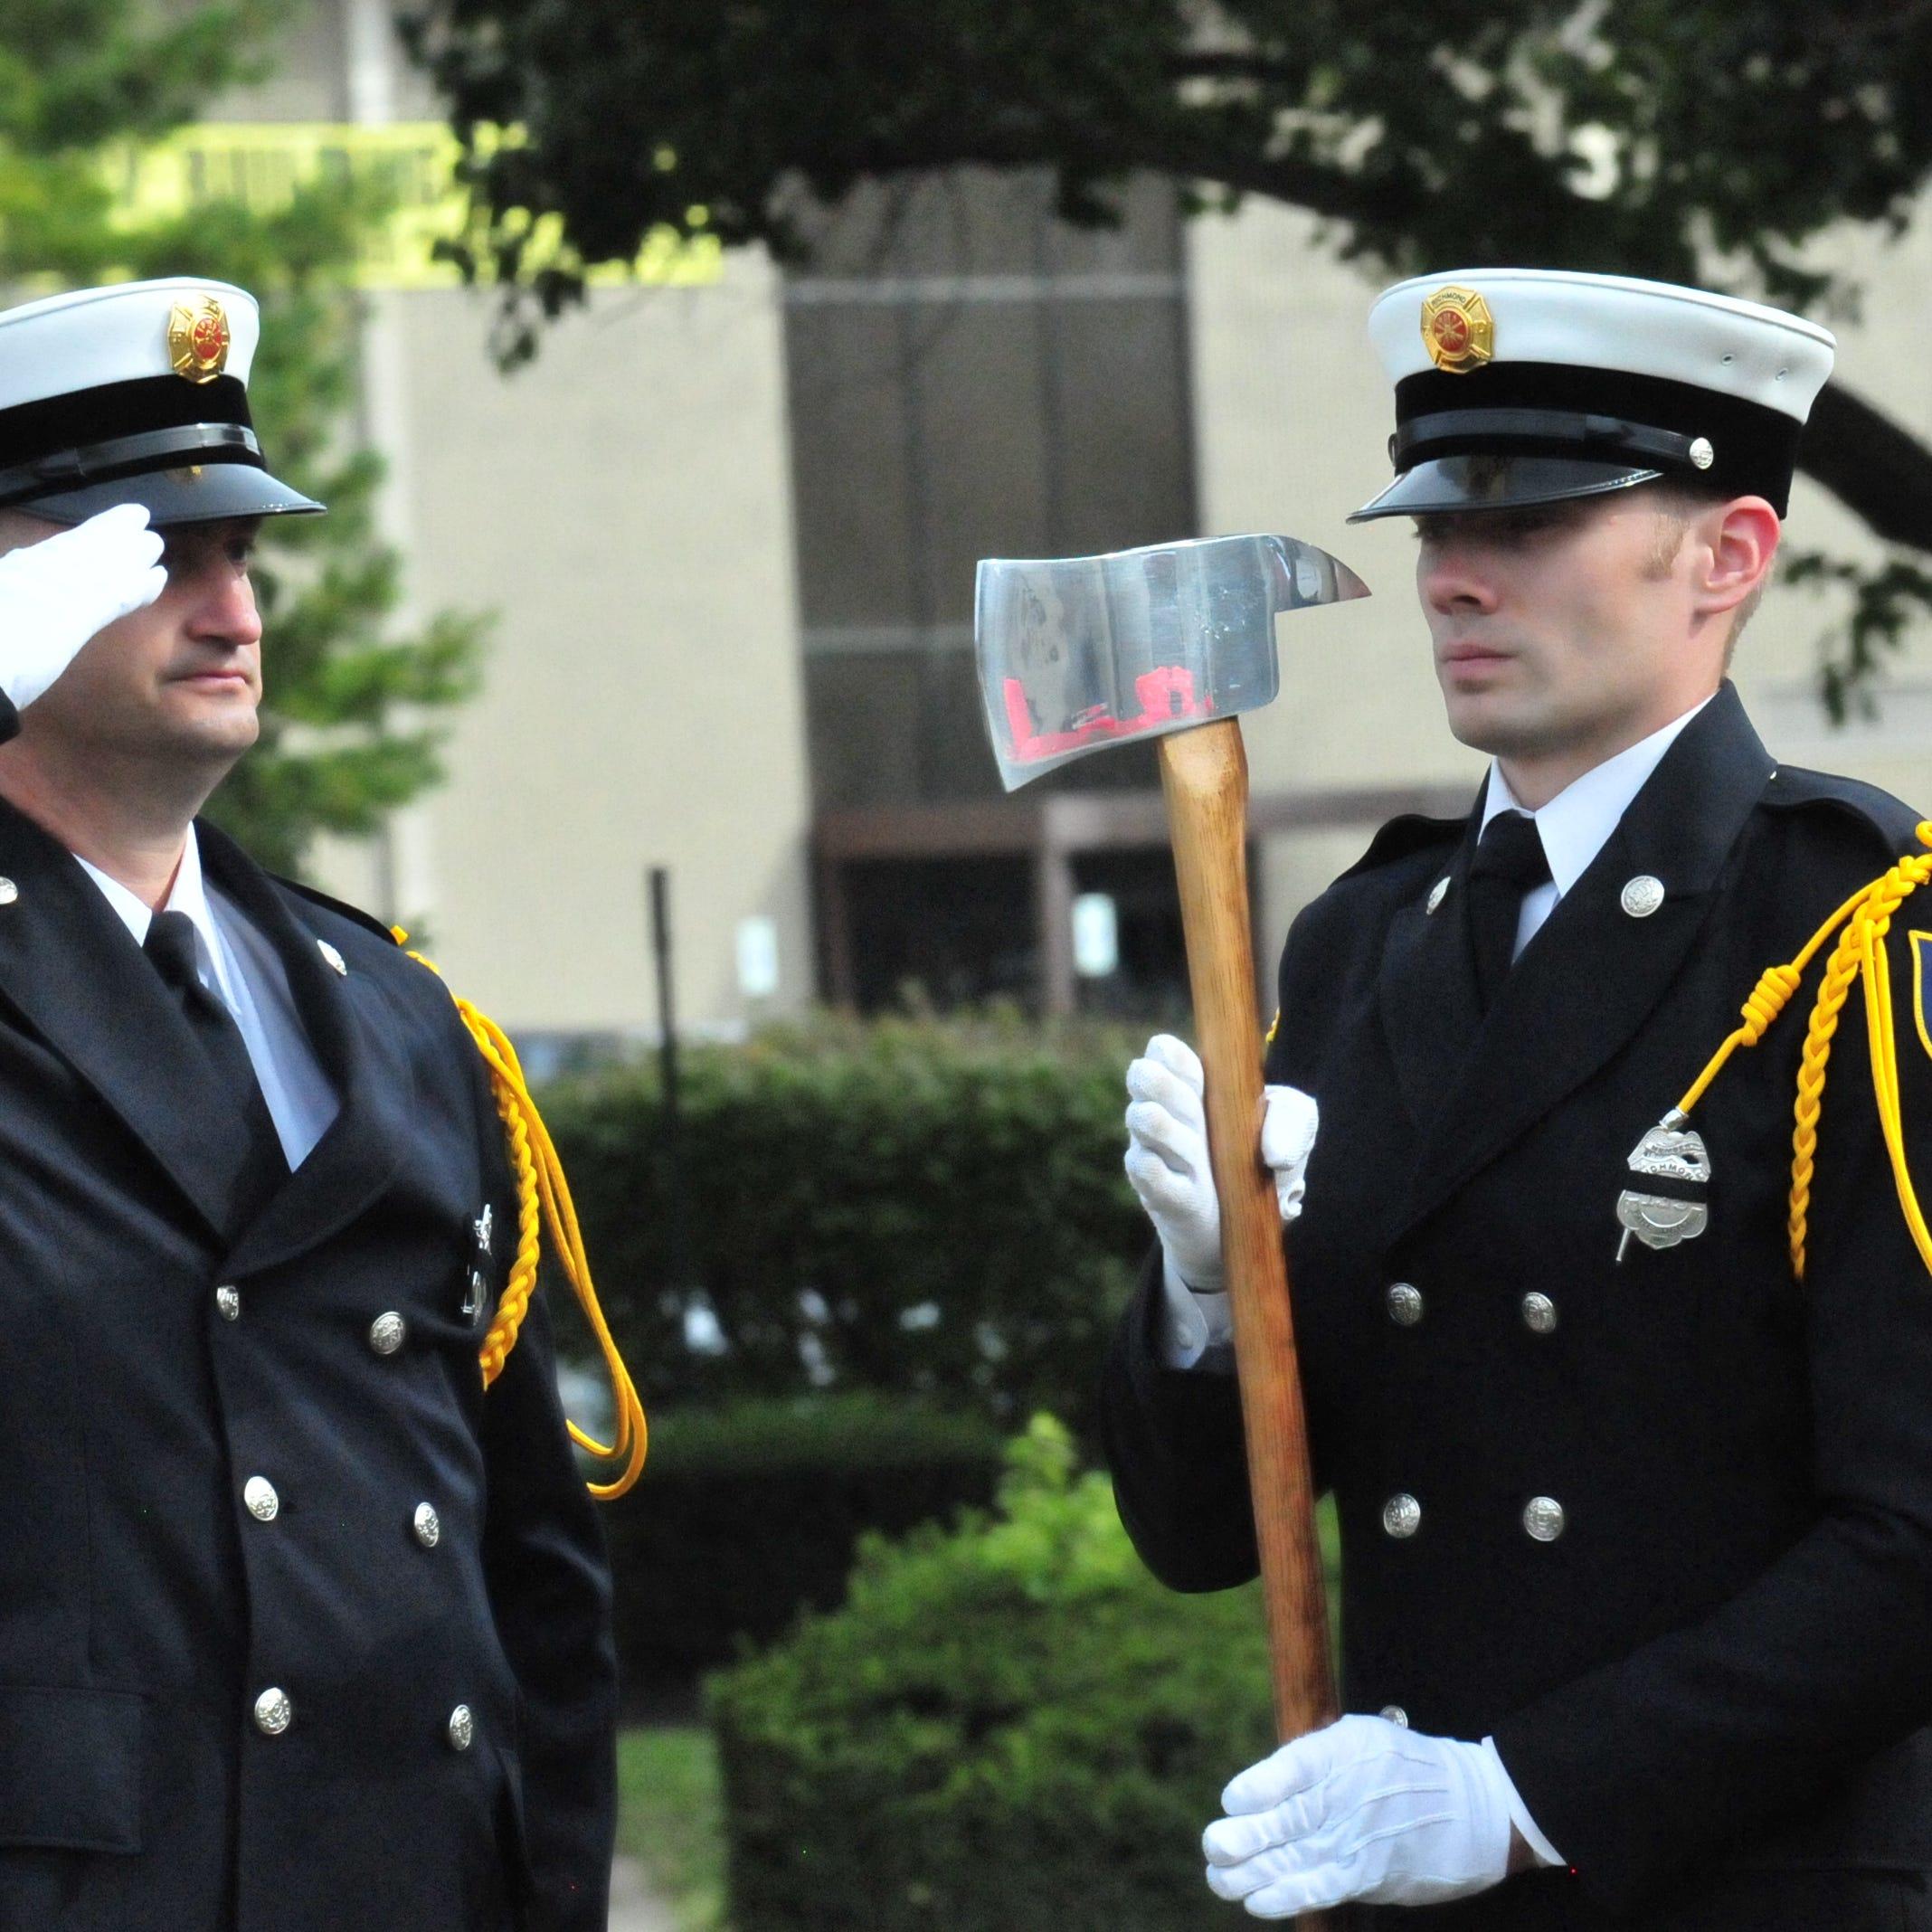 RFD memorial service recognizes mental, emotional toll on responders